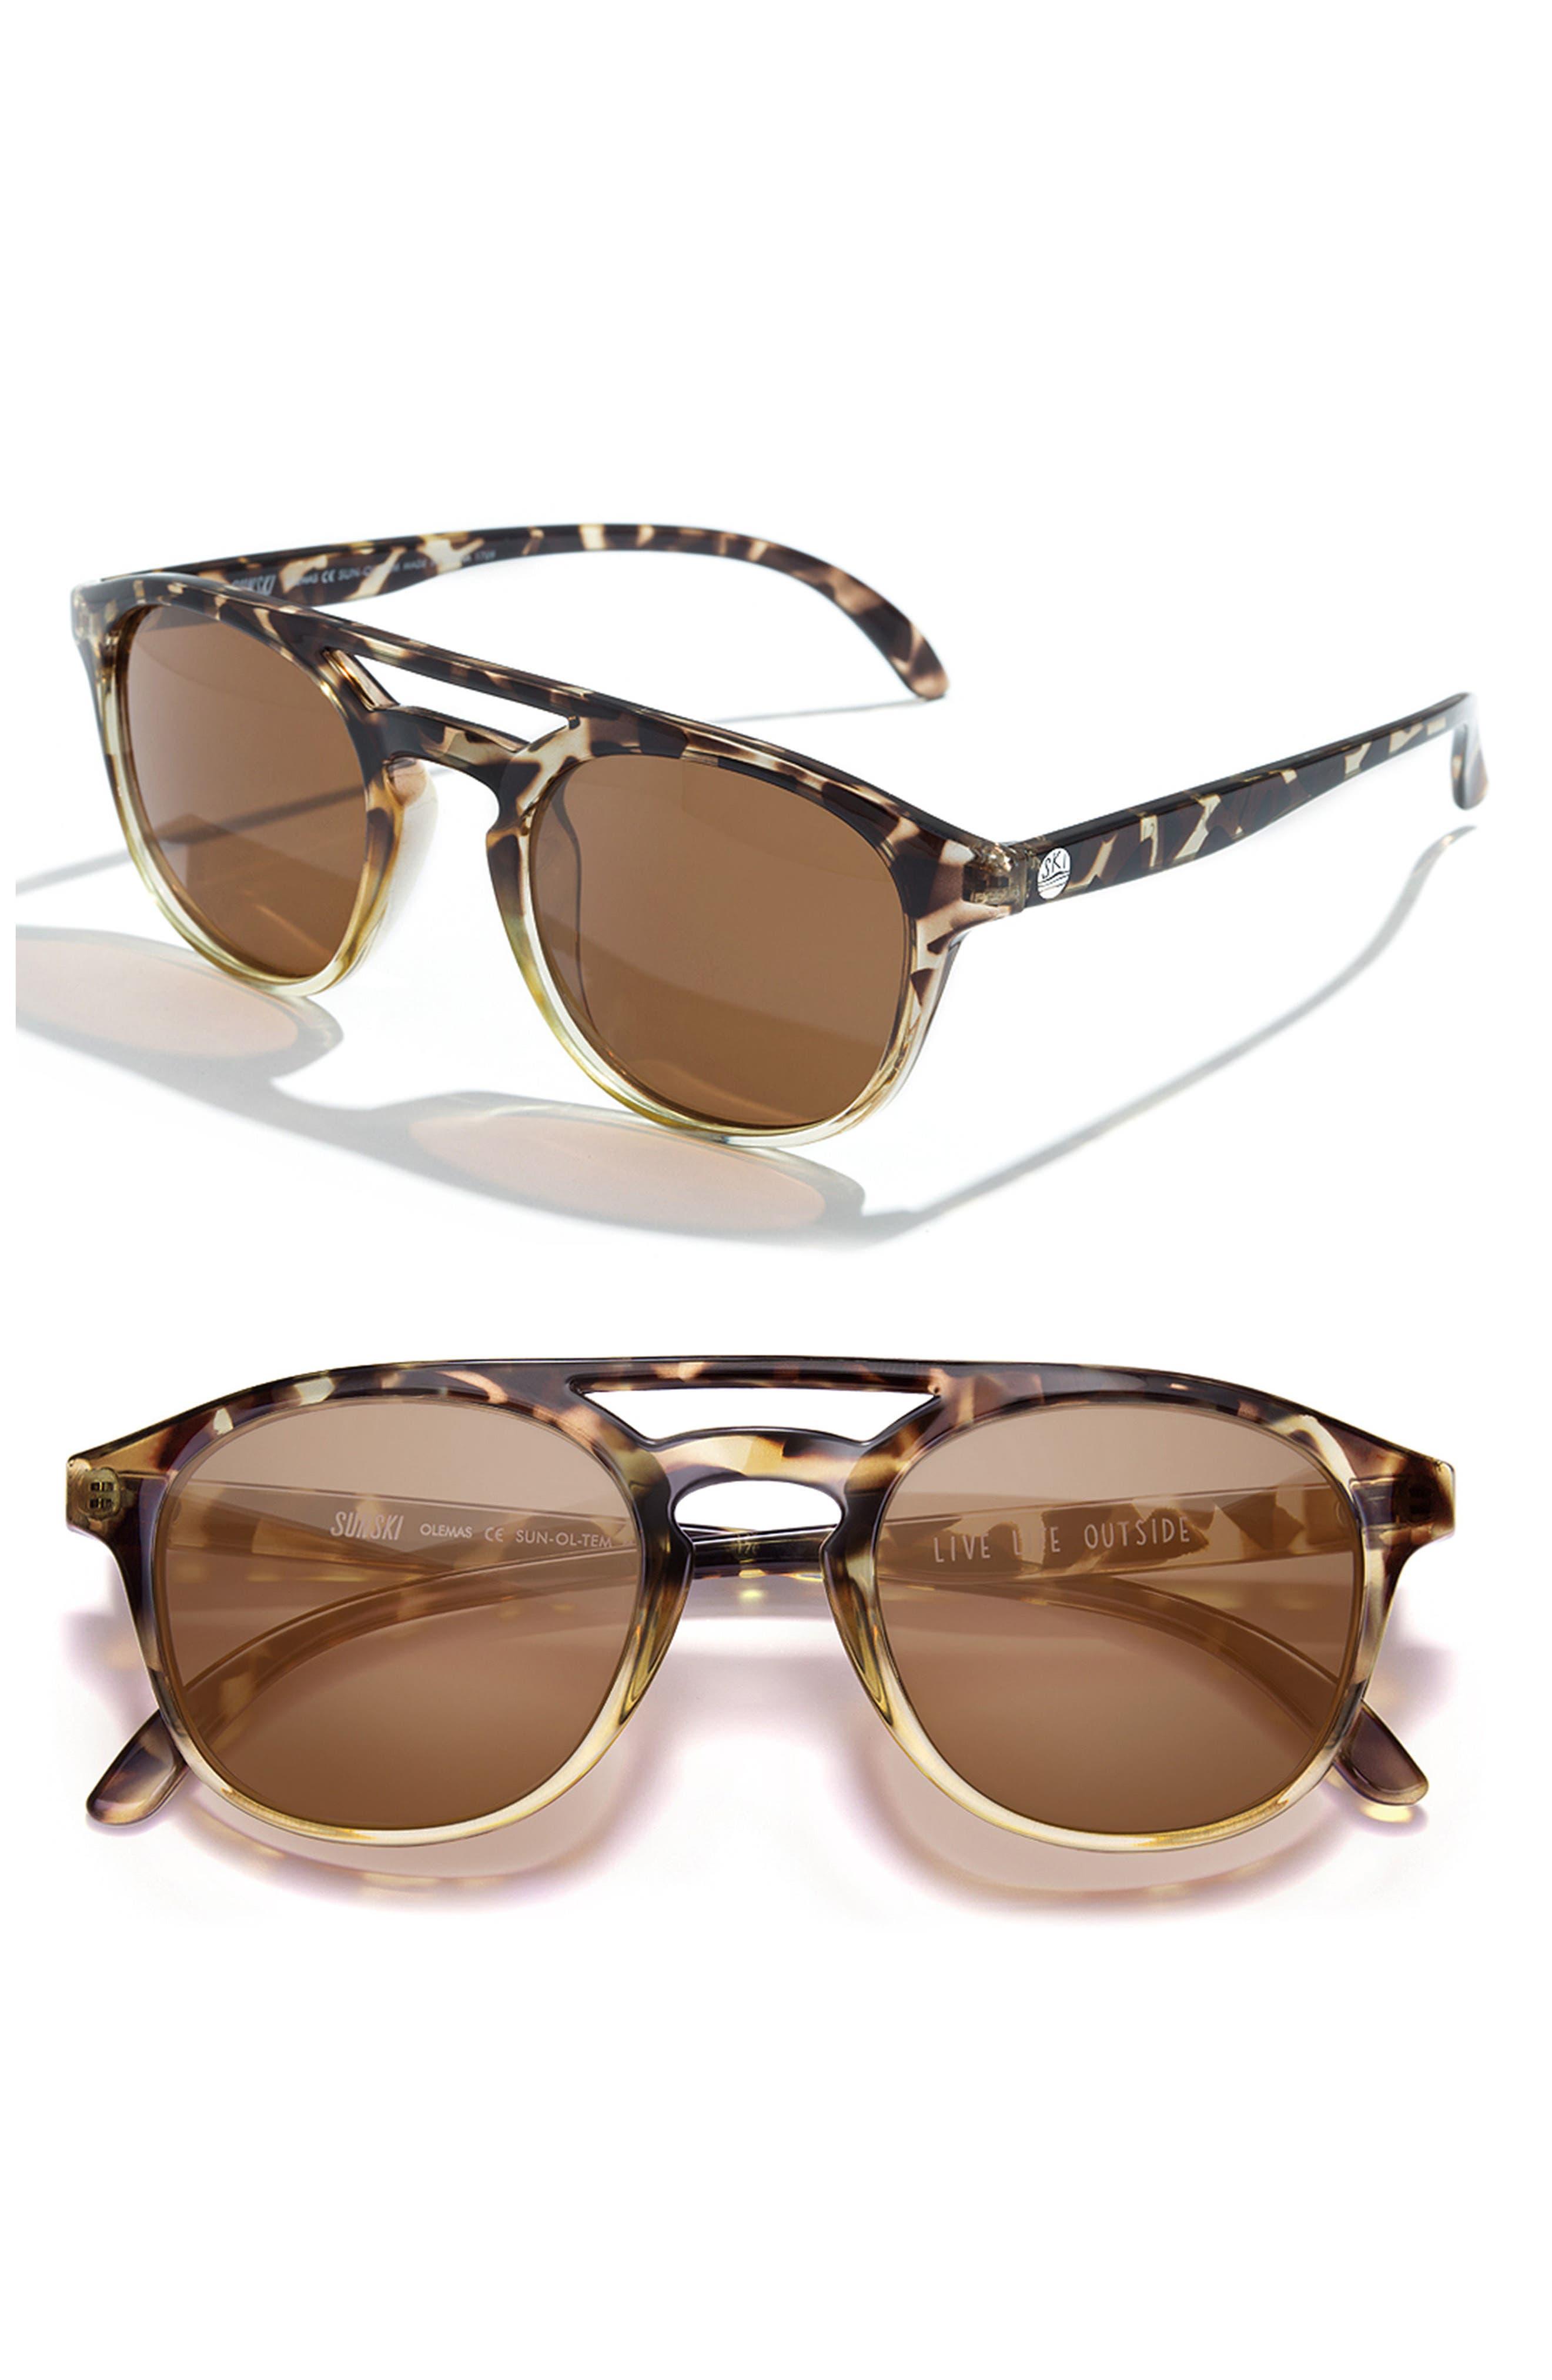 Olema 53mm Polarized Sunglasses,                         Main,                         color, TORTOISE AMBER